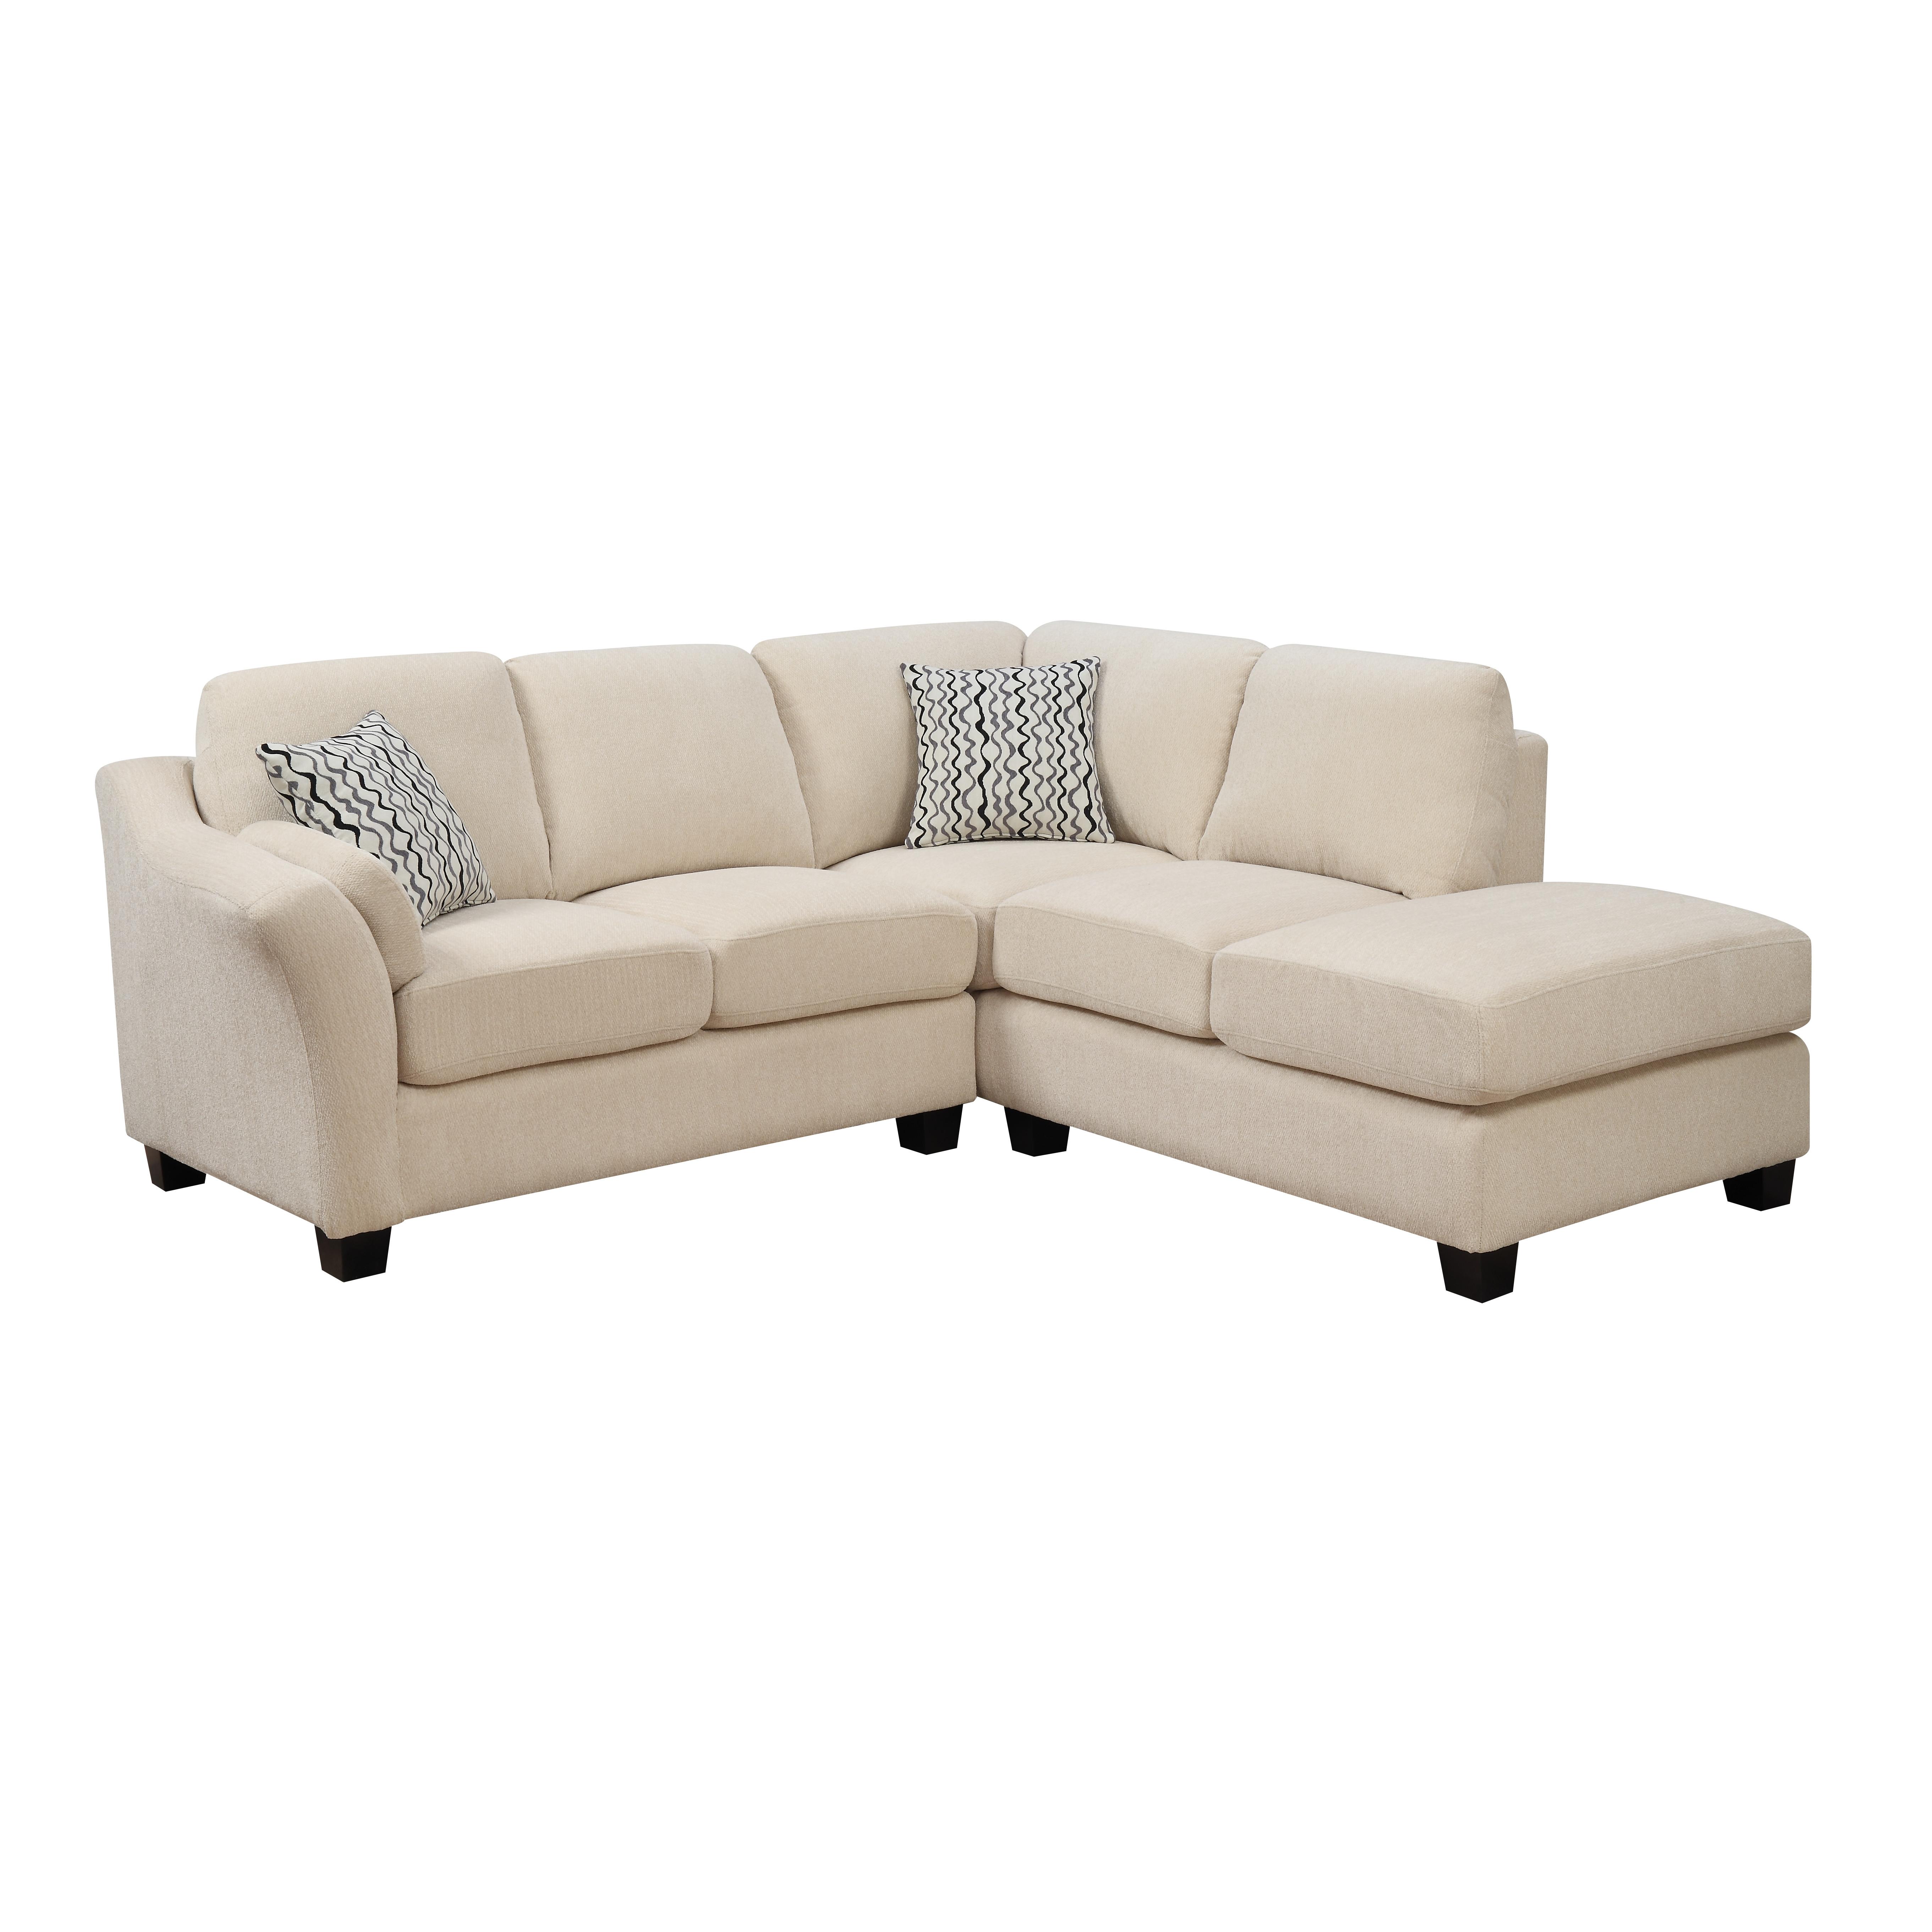 Emerald Home Clayton II Sofa Chaise Sectional